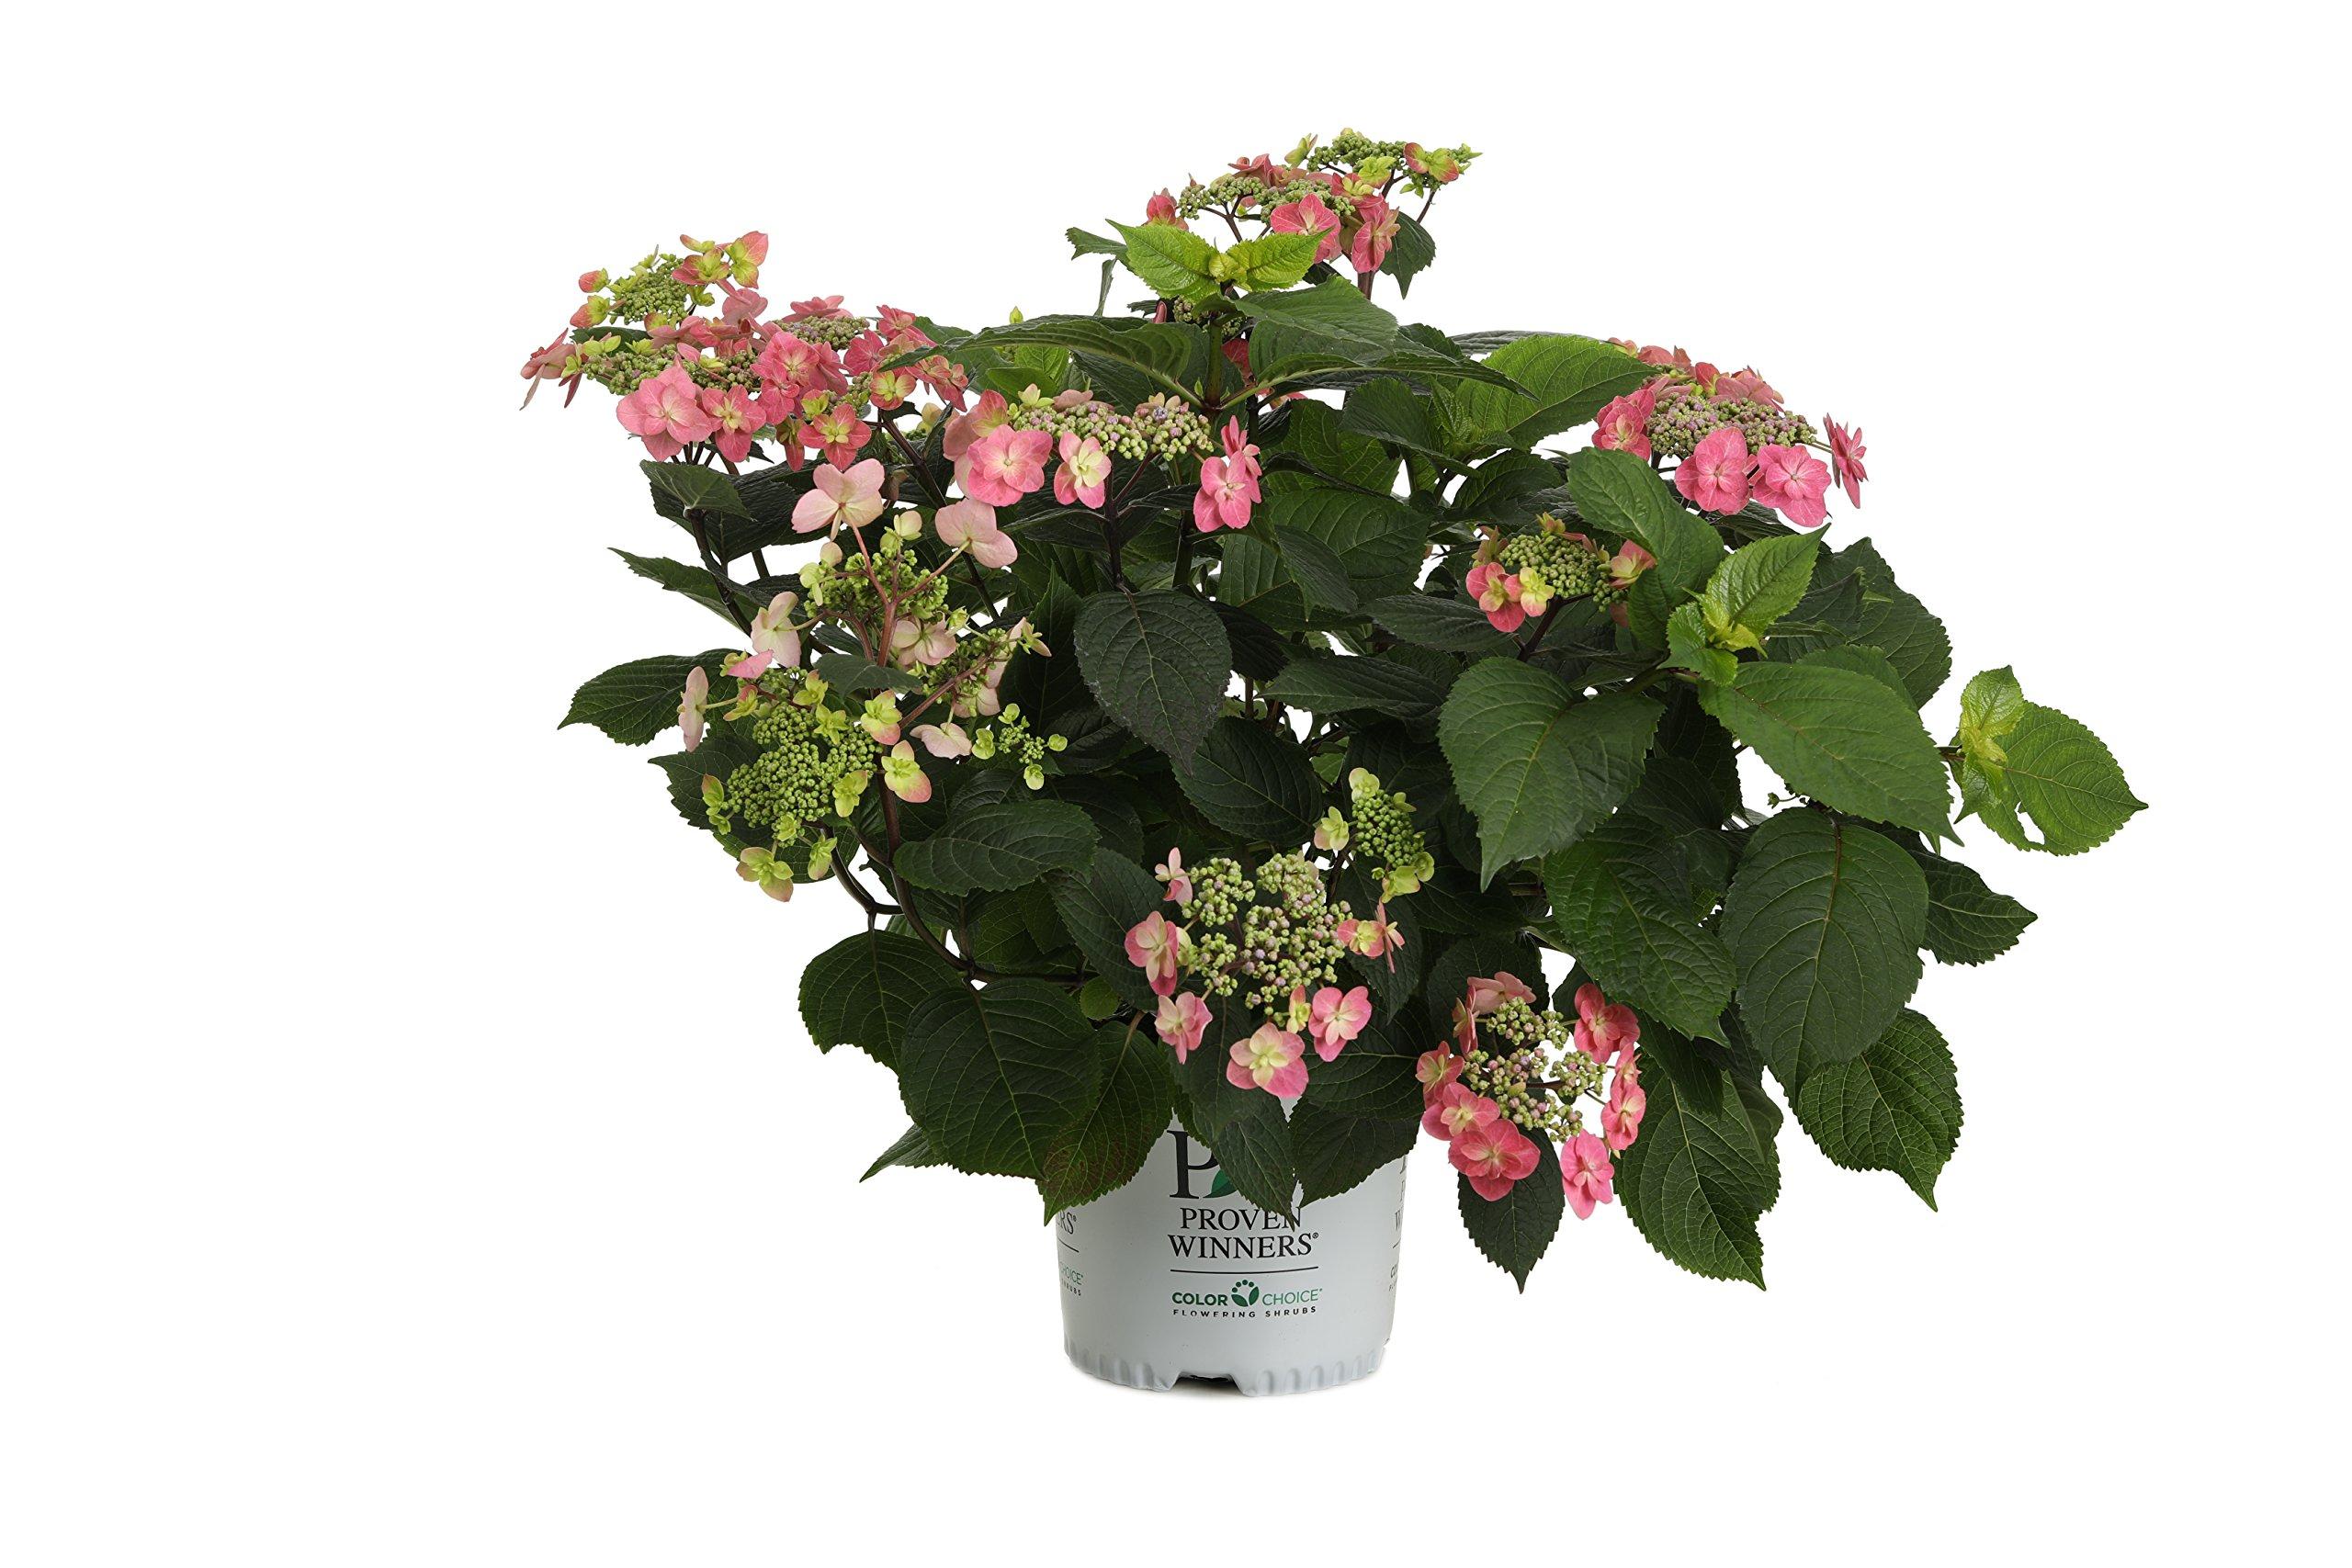 Tuff Stuff Red (Mountain Hydrangea) Live Shrub, Pink to Red Flowers, 1 Gallon